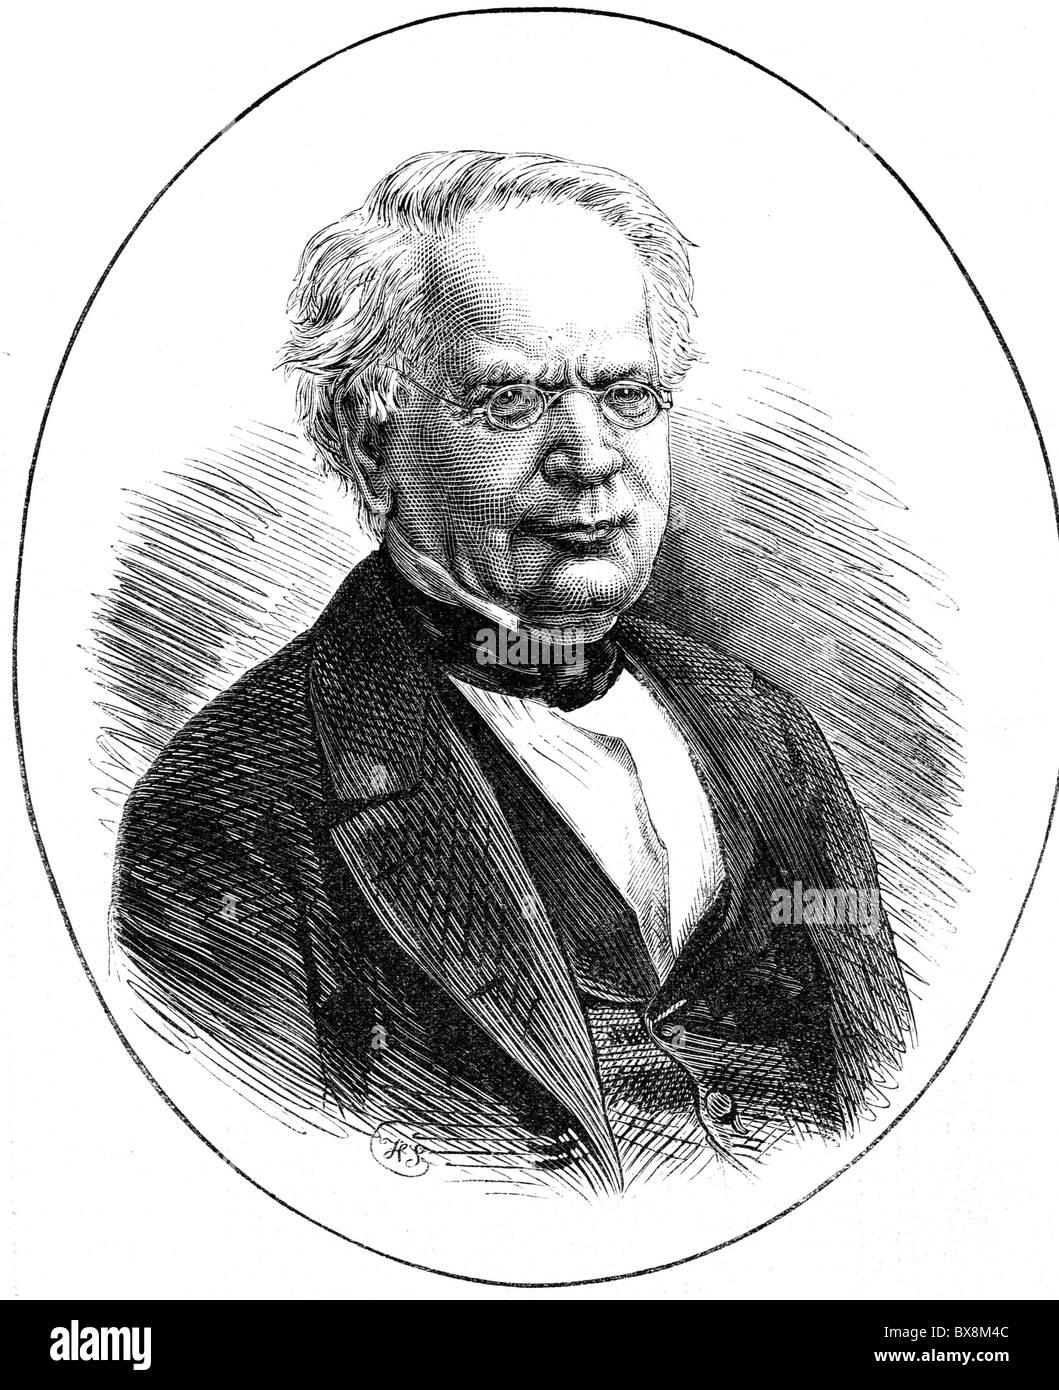 Moerikofer, Johann Kaspar, 11.10.1799 - 17.10.1877, Swiss theologian, portrait, published in 1877, Additional-Rights Stock Photo